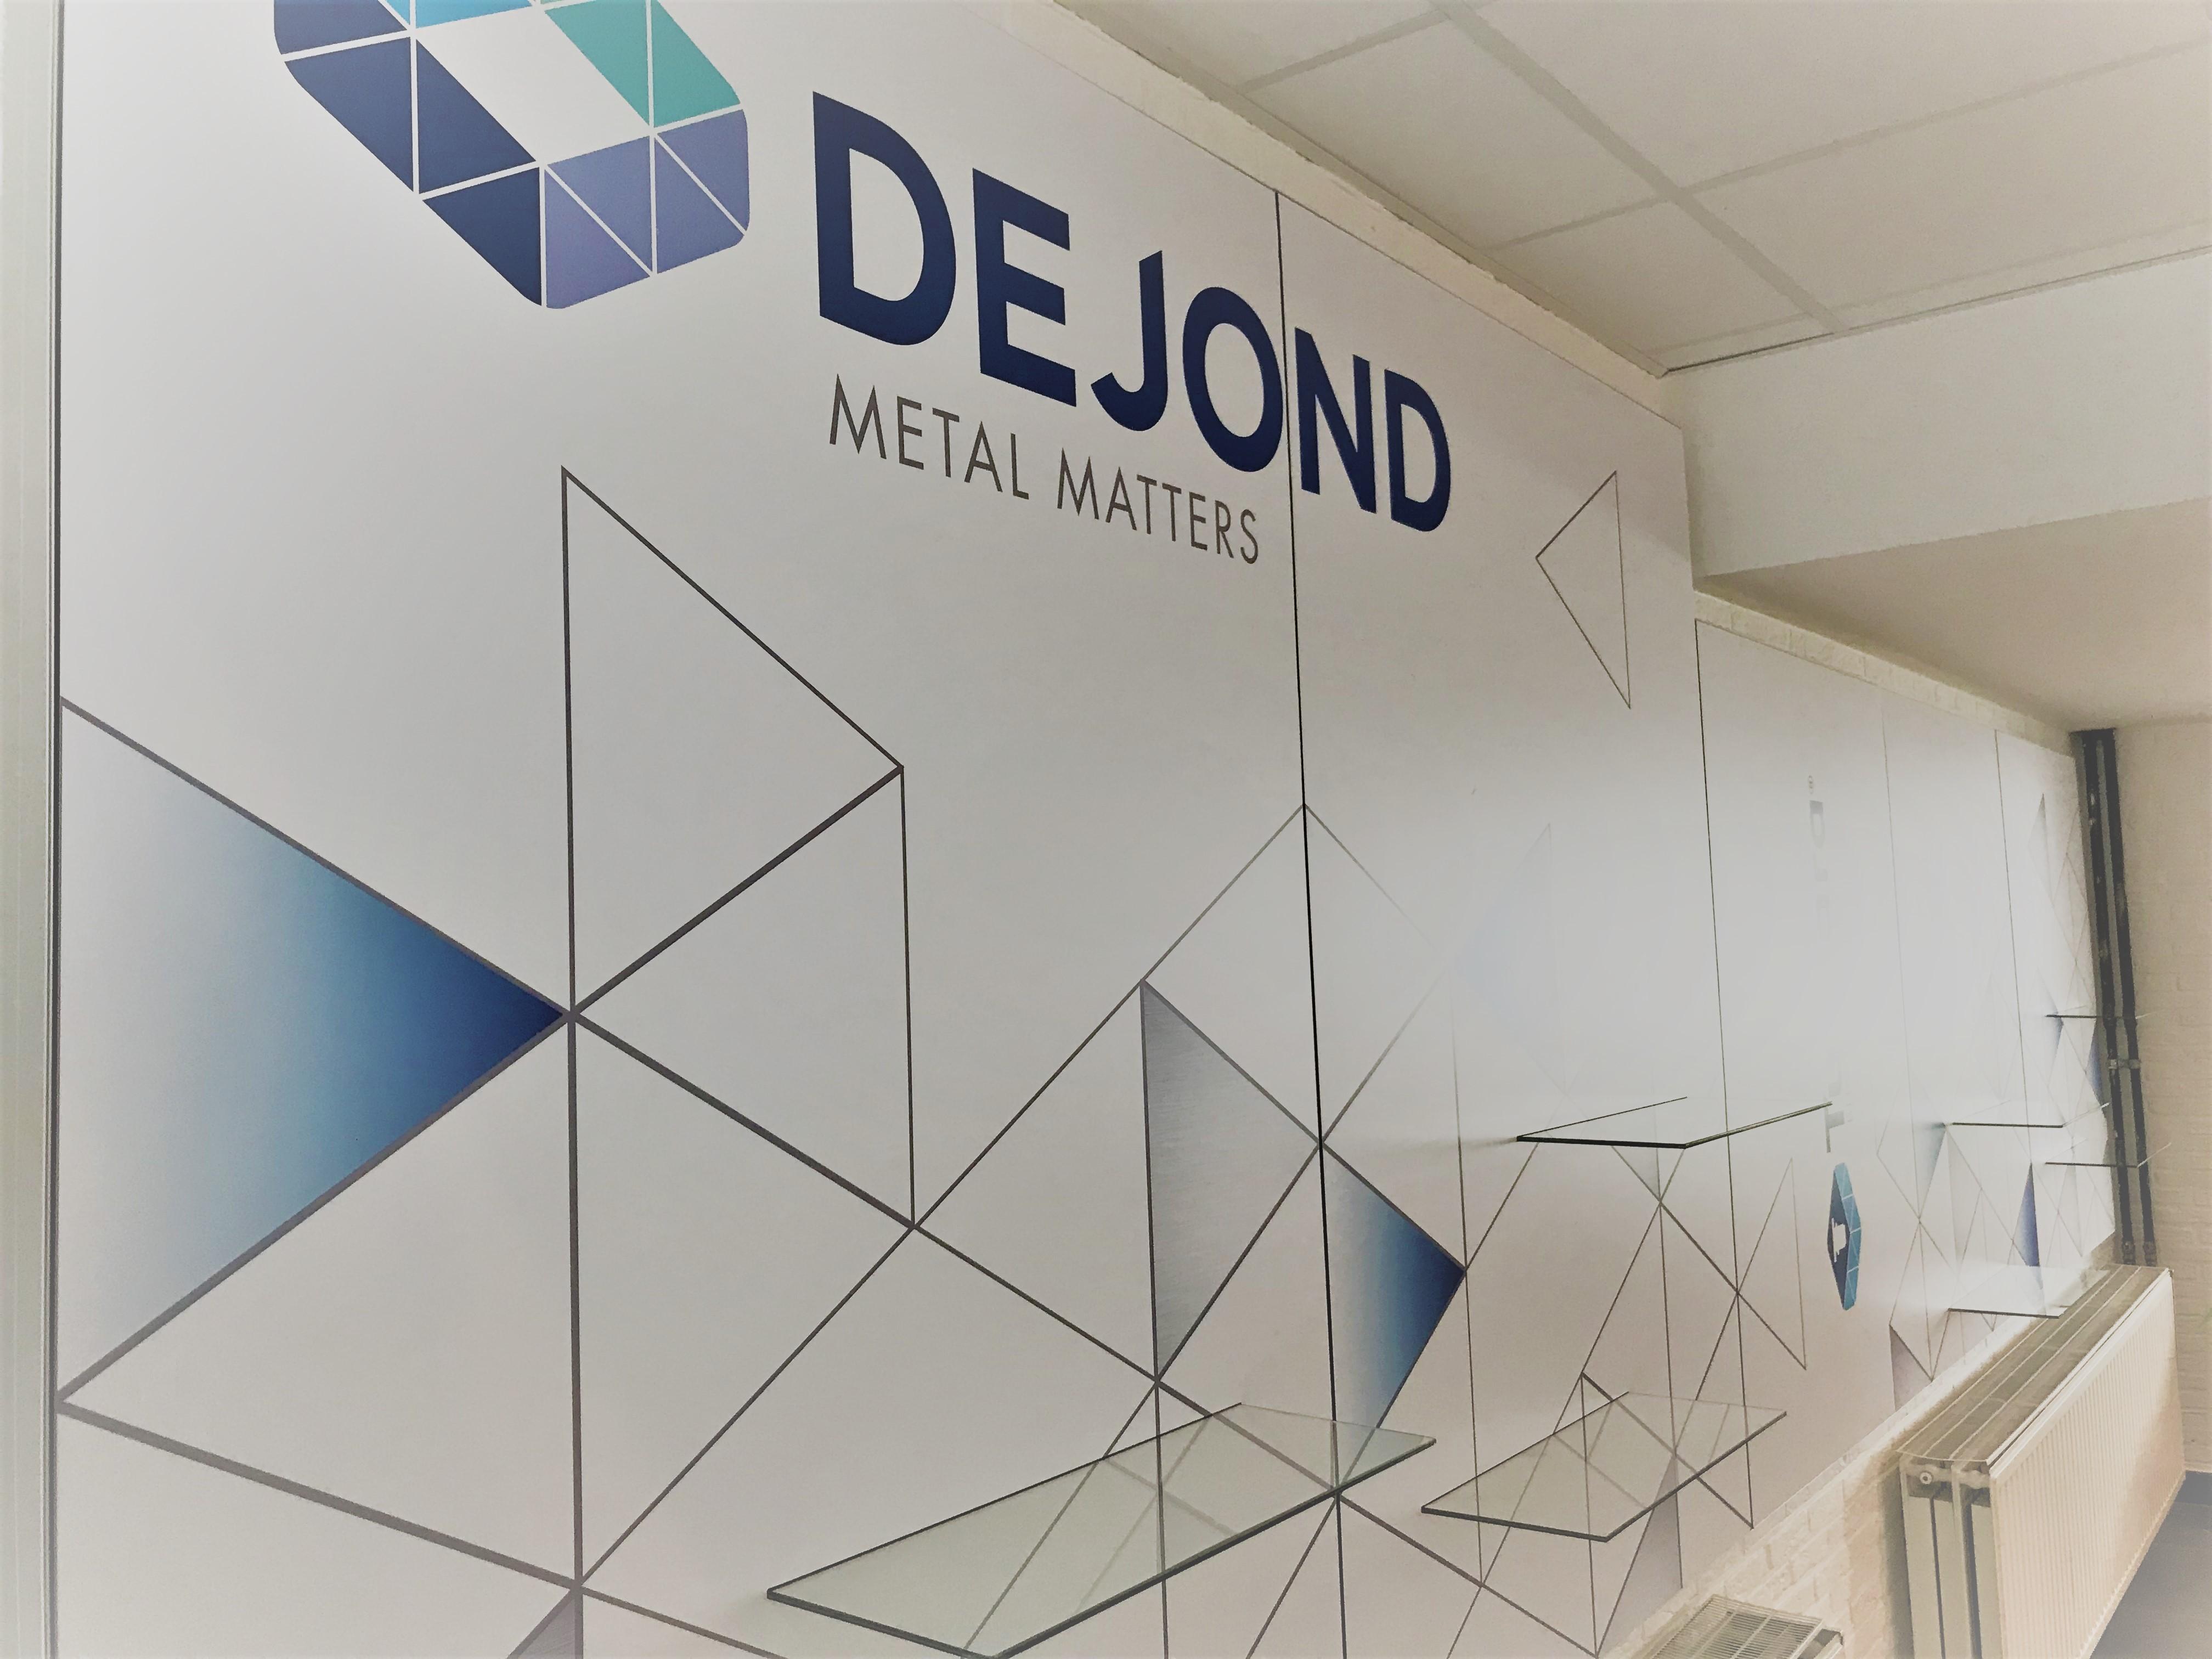 dejond-inkom-hal-modulaire-wand-branding-frameworks